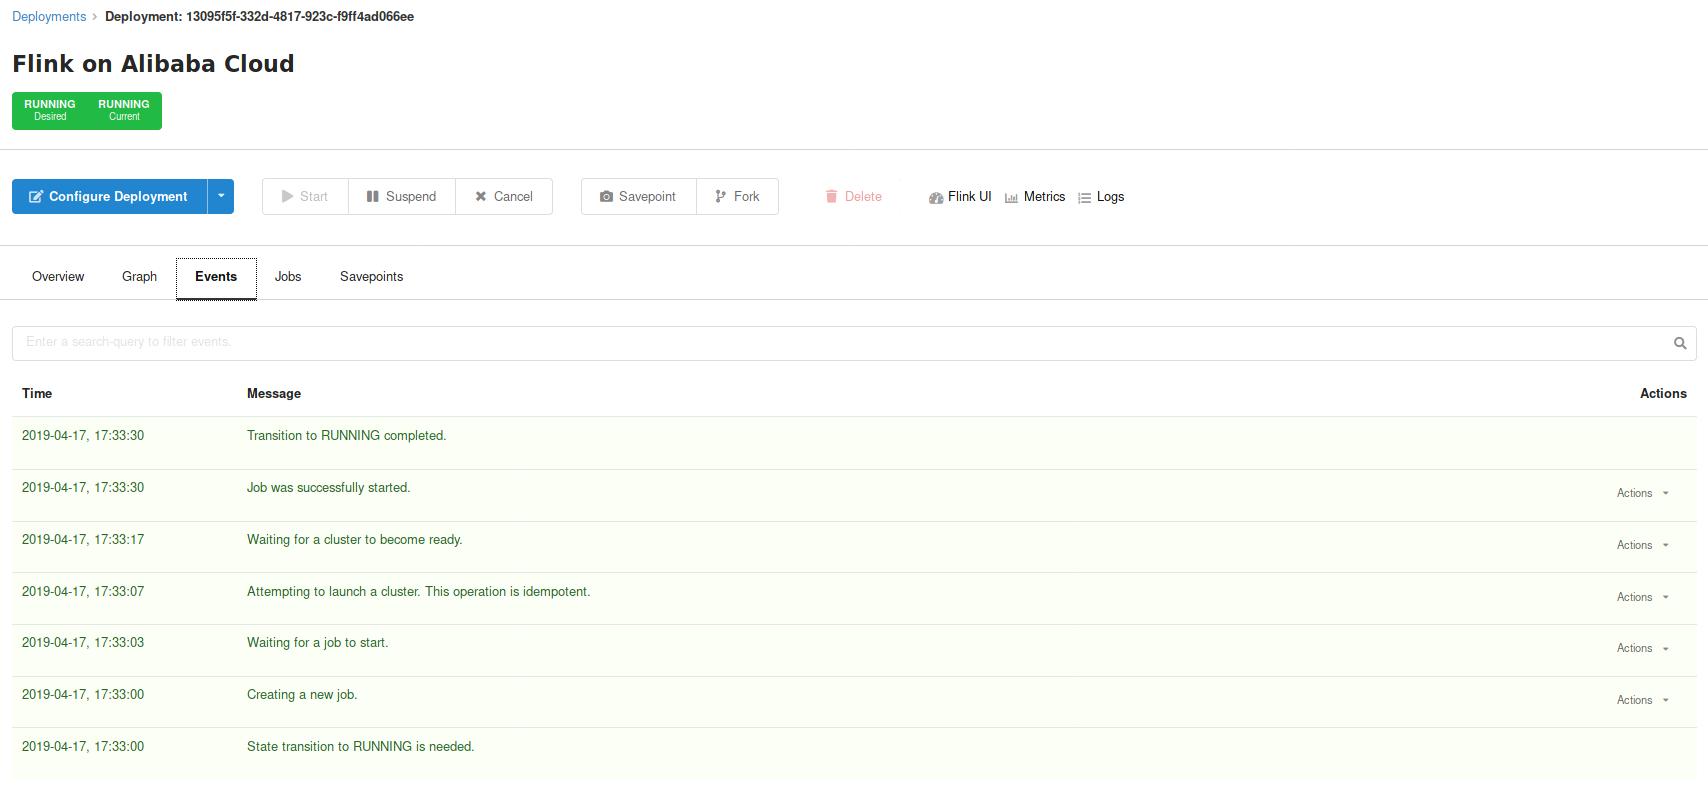 Ververica Platform, Alibaba Cloud, image 3